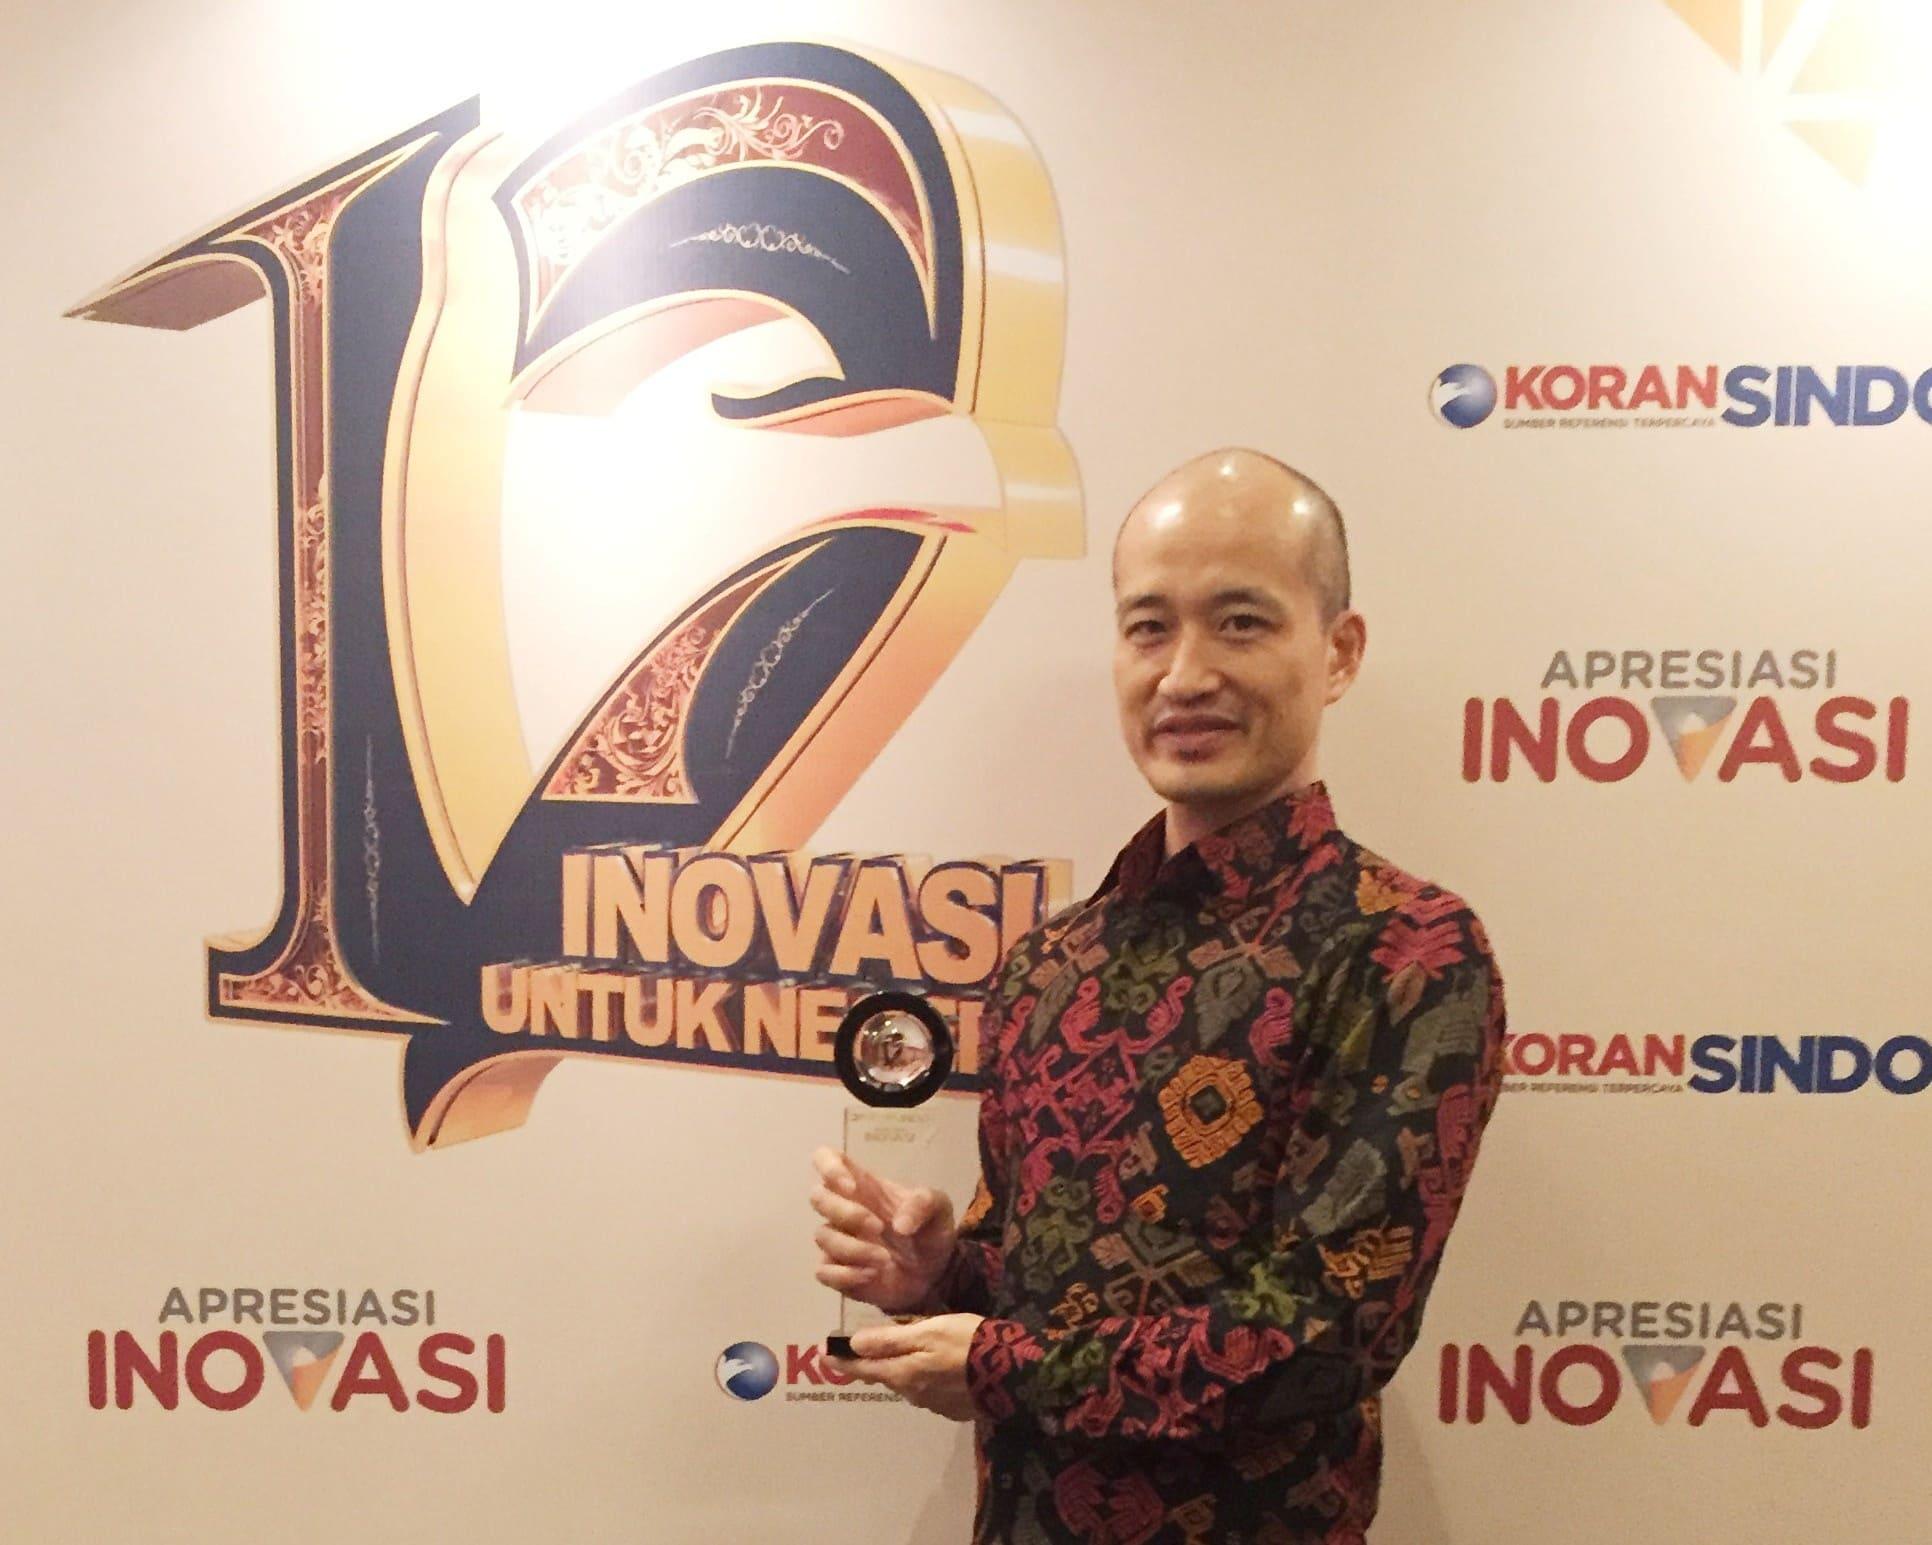 c2086-r.-uchiki-mewakili-manajemen-pt-sis-menerima-penghargaan-apresiasi-inovasi.jpg